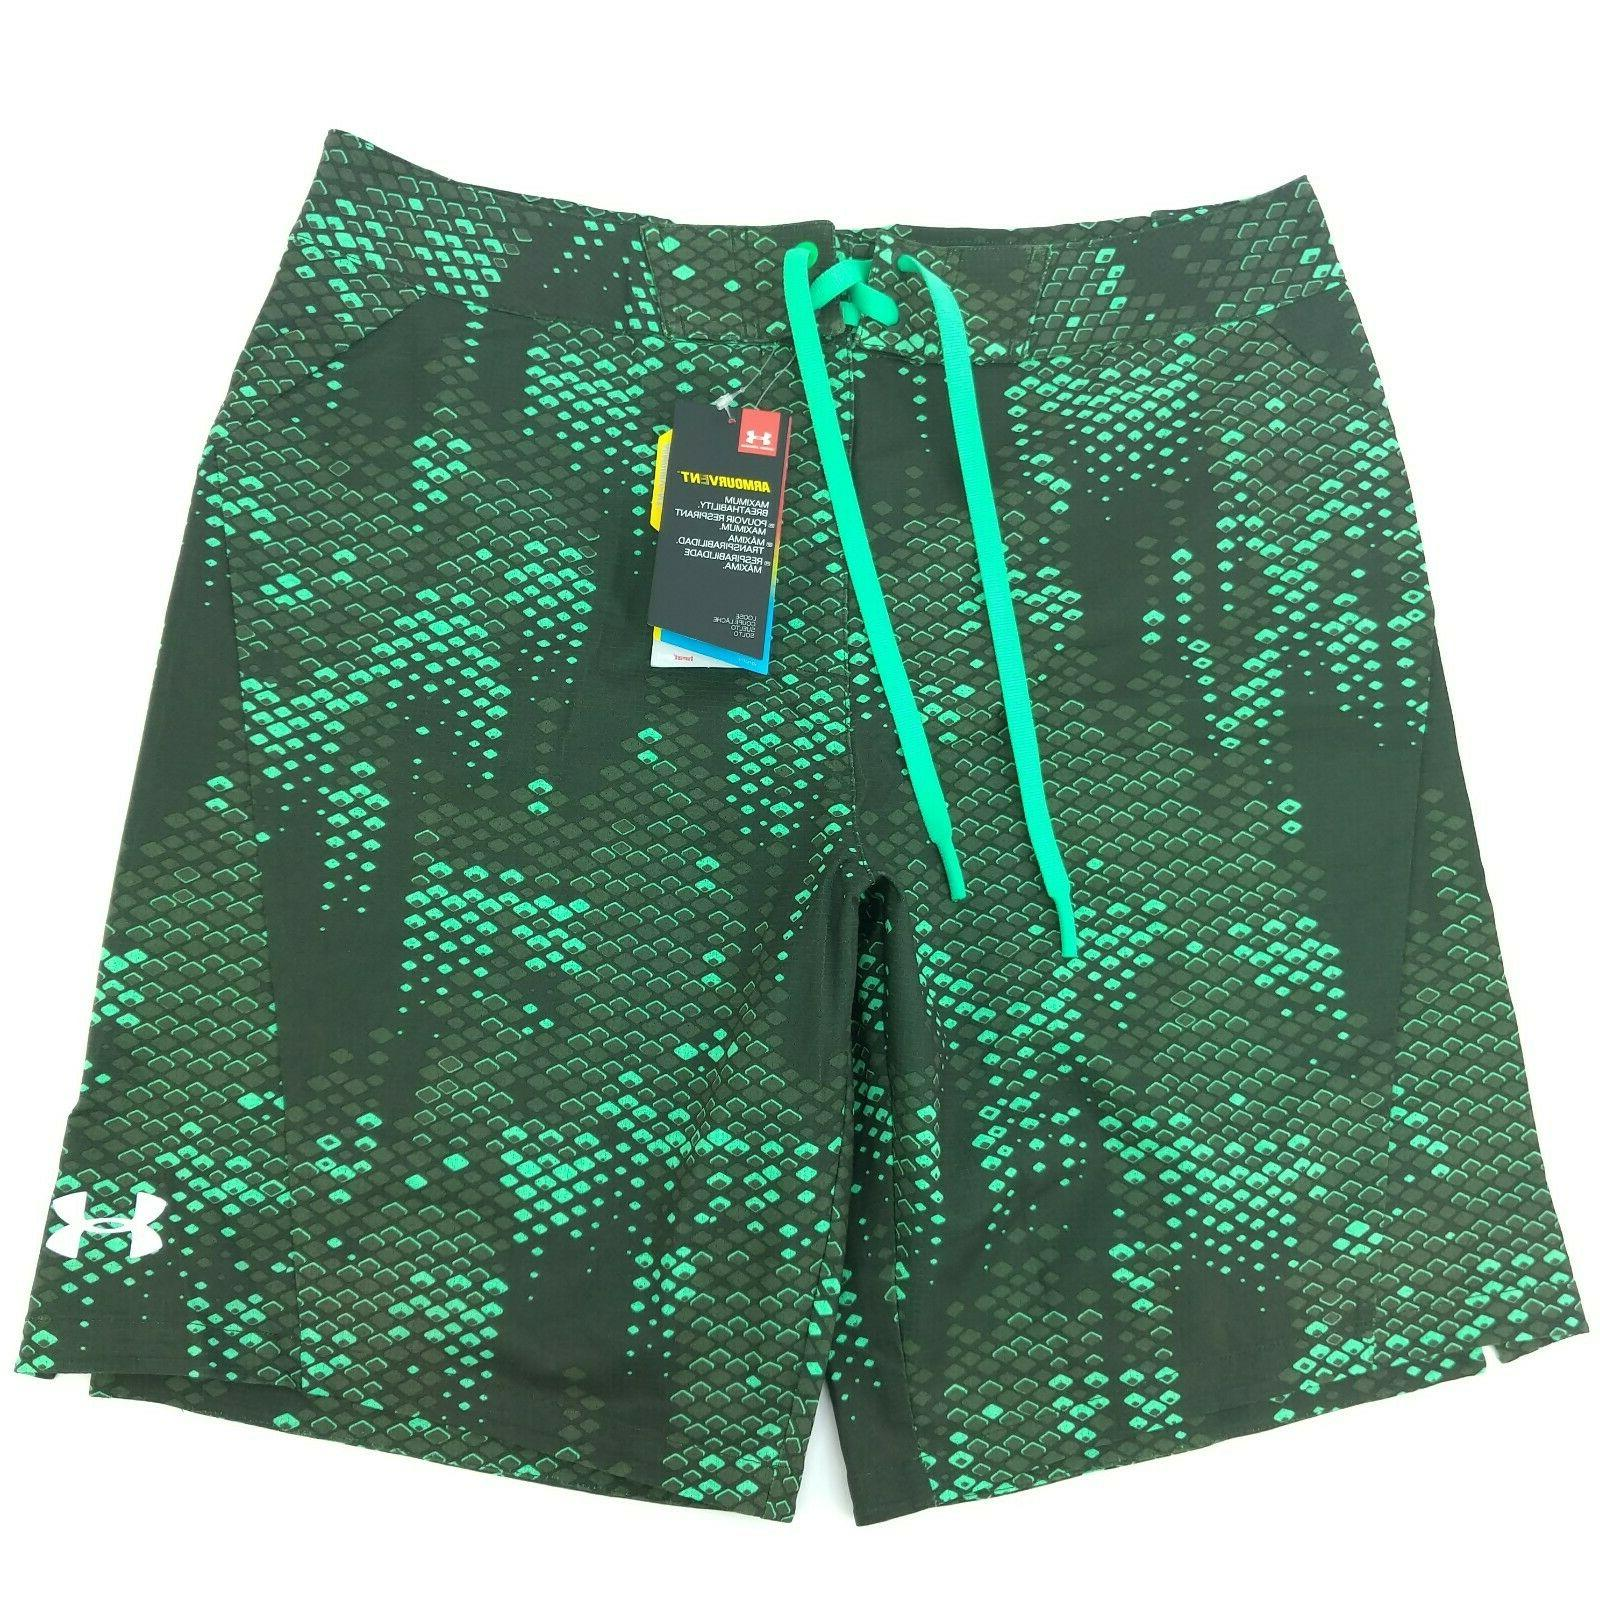 new mens 34 heatgear green board shorts